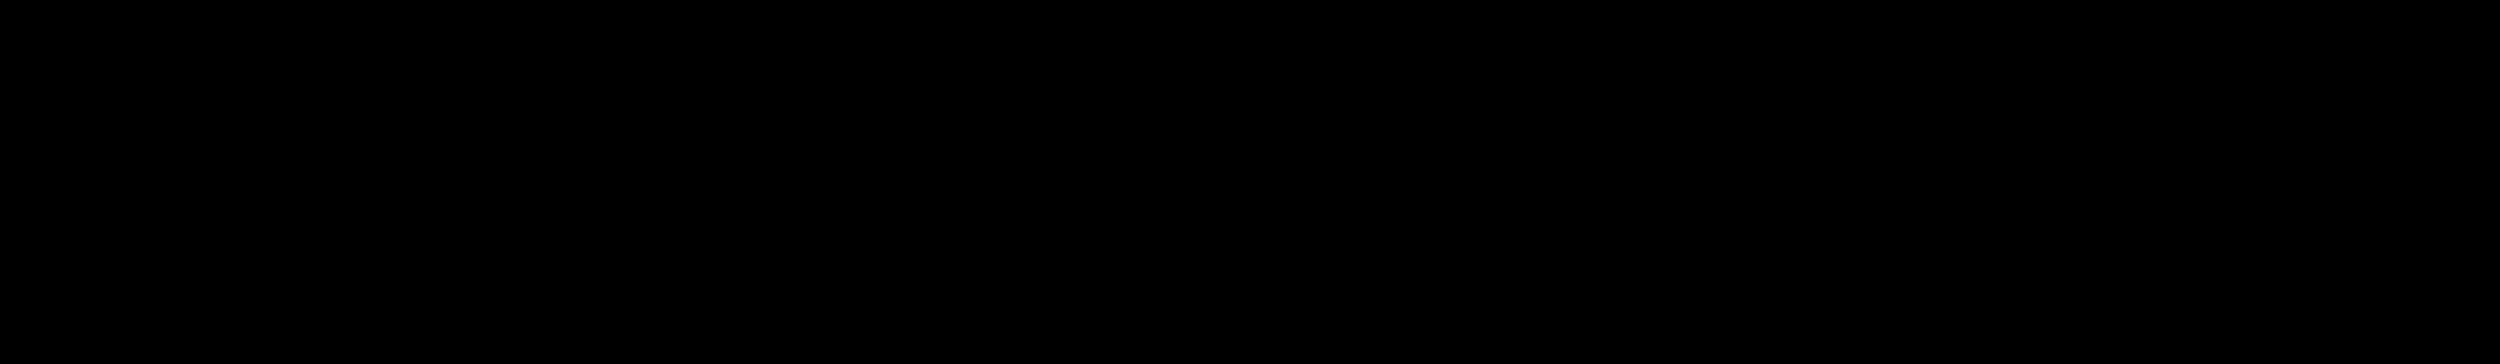 logo-Netatmo-BLACK-PRINT.png